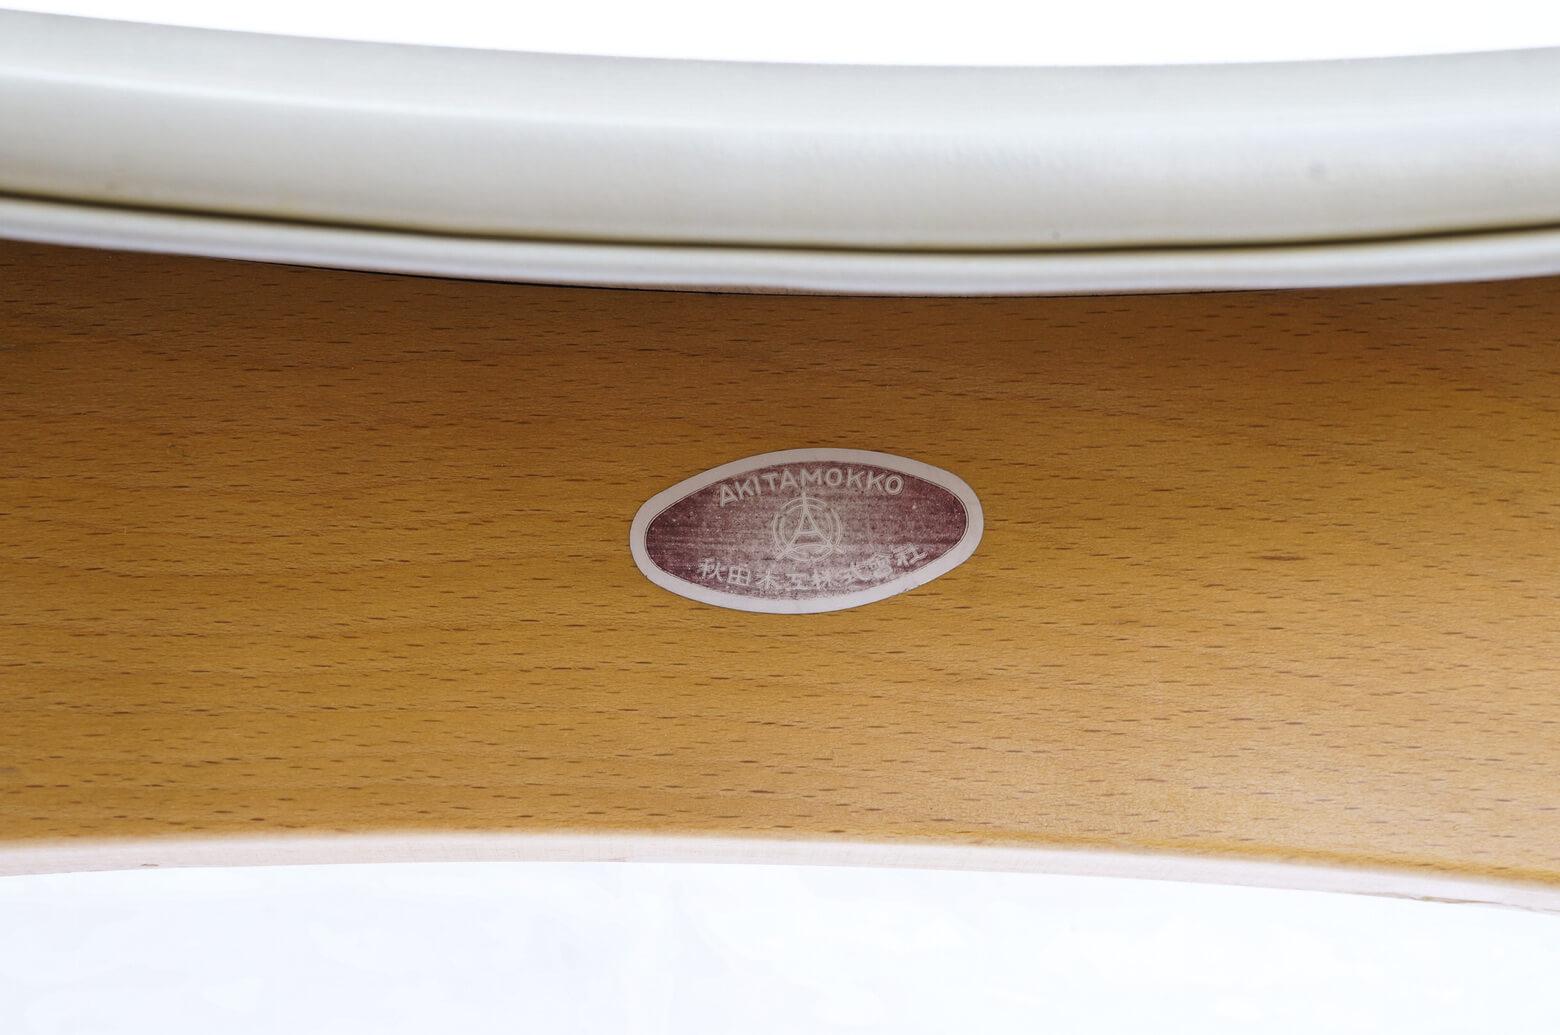 Akita Mokko Stacking Stool No.202 designed by Kenmochi Isamu/秋田木工 スタッキングスツール 剣持勇デザイン ジャパニーズモダン グレー 1